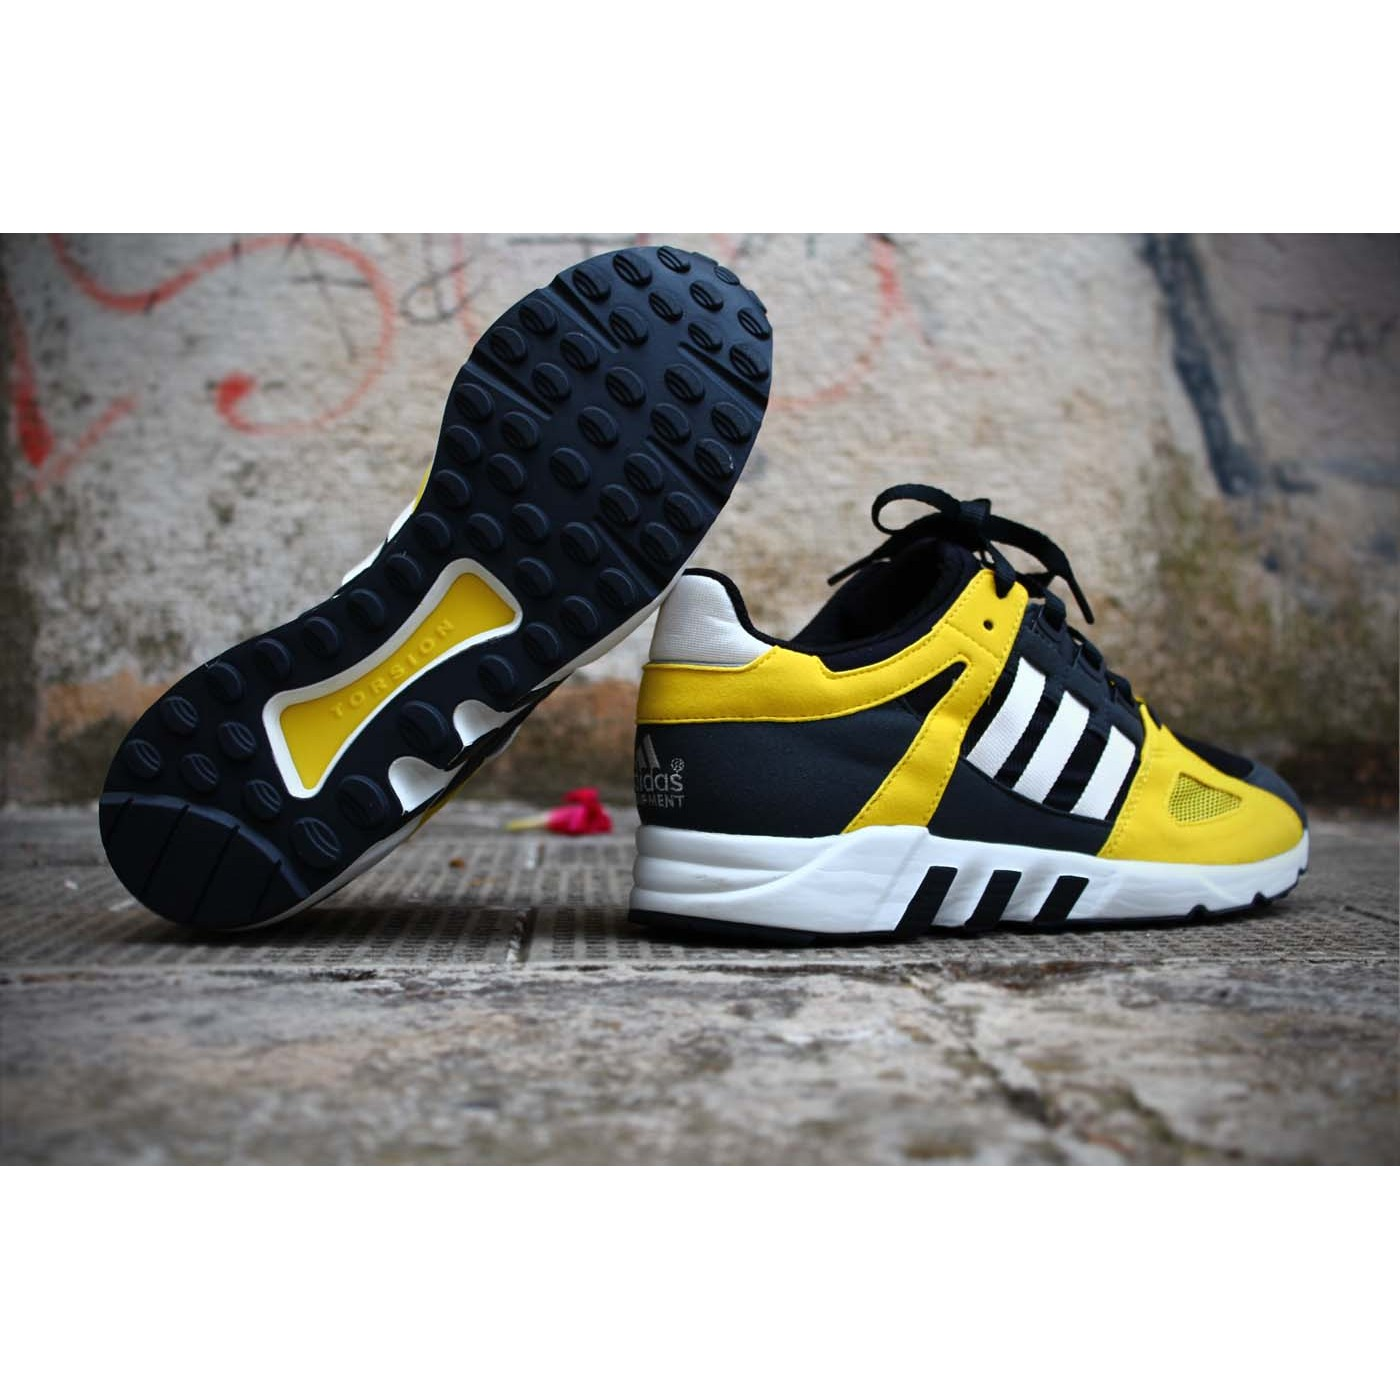 buy online c2c11 d7718 adidas-equipment-guidance-93-m25499-blackwhiteyellow677